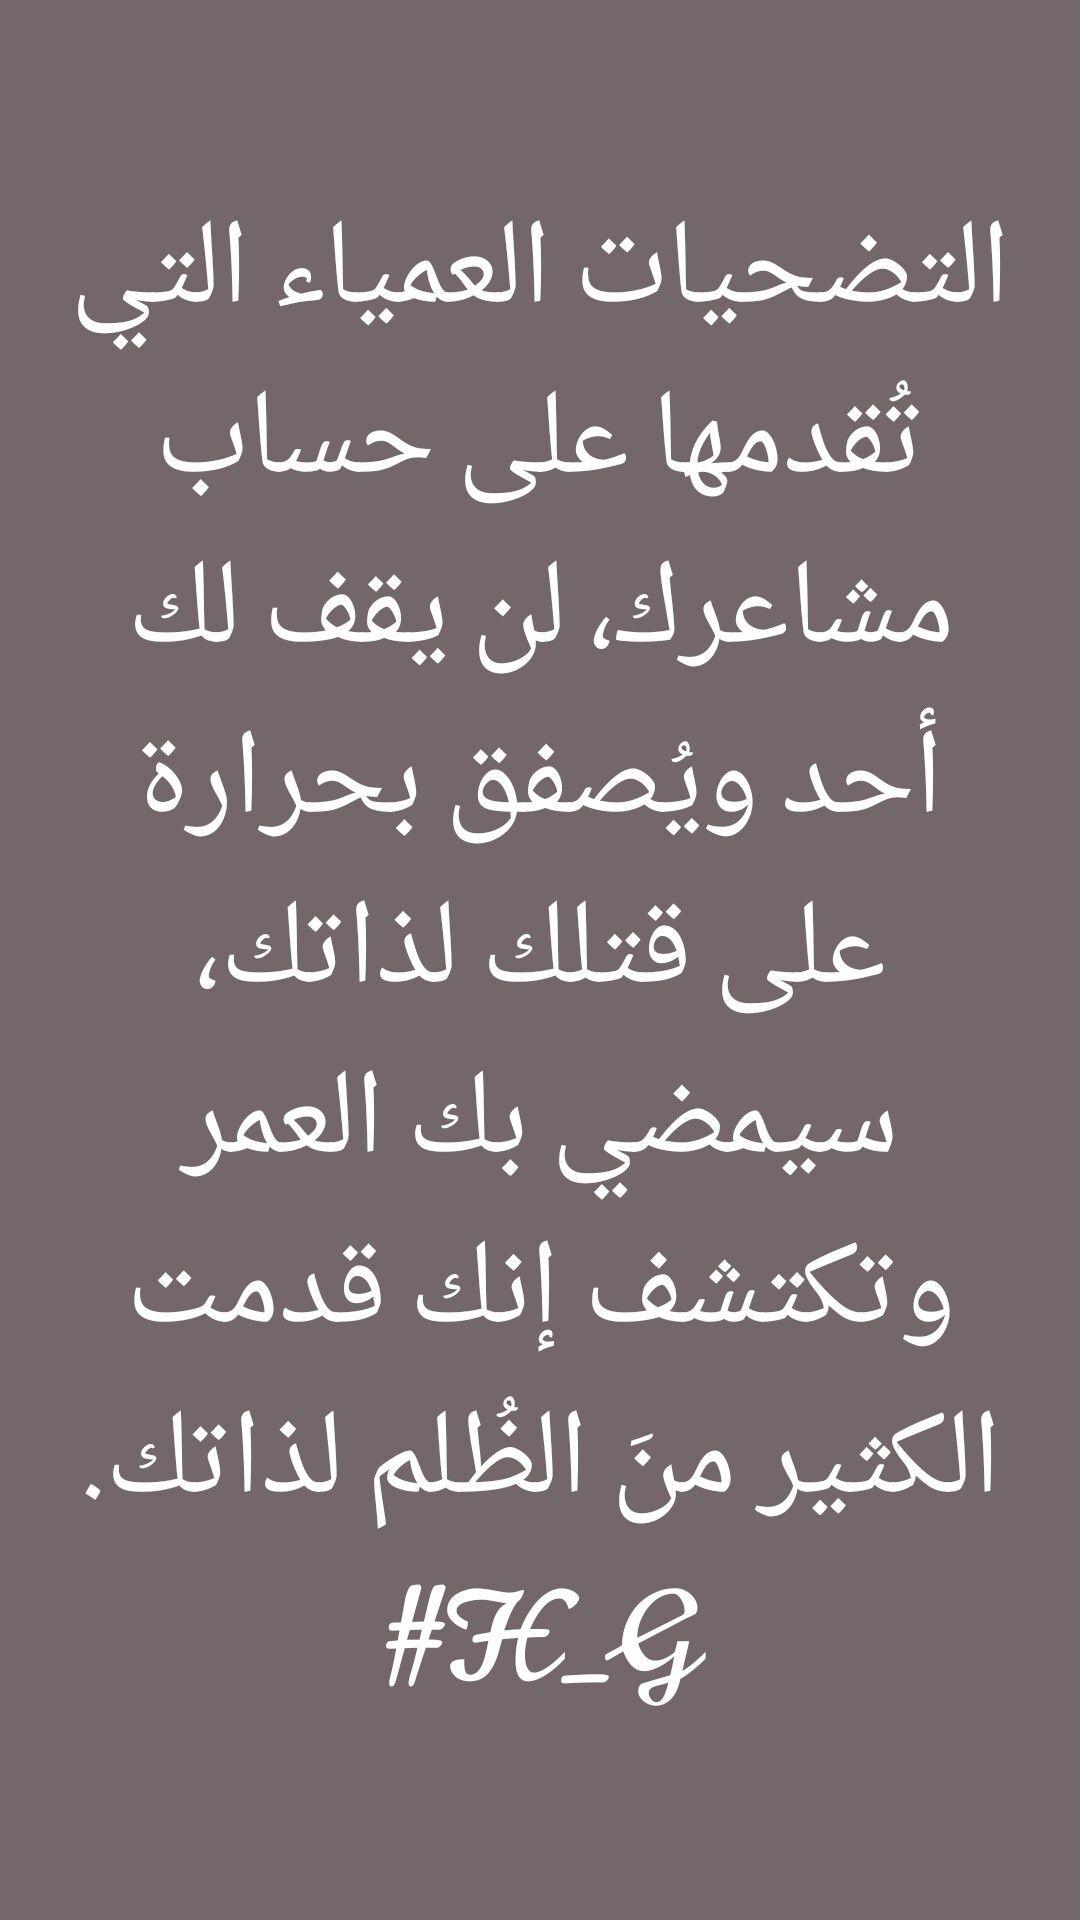 Pin By Faten Sleem On اقوال بليغه Arabic Quotes Words Arabic Words